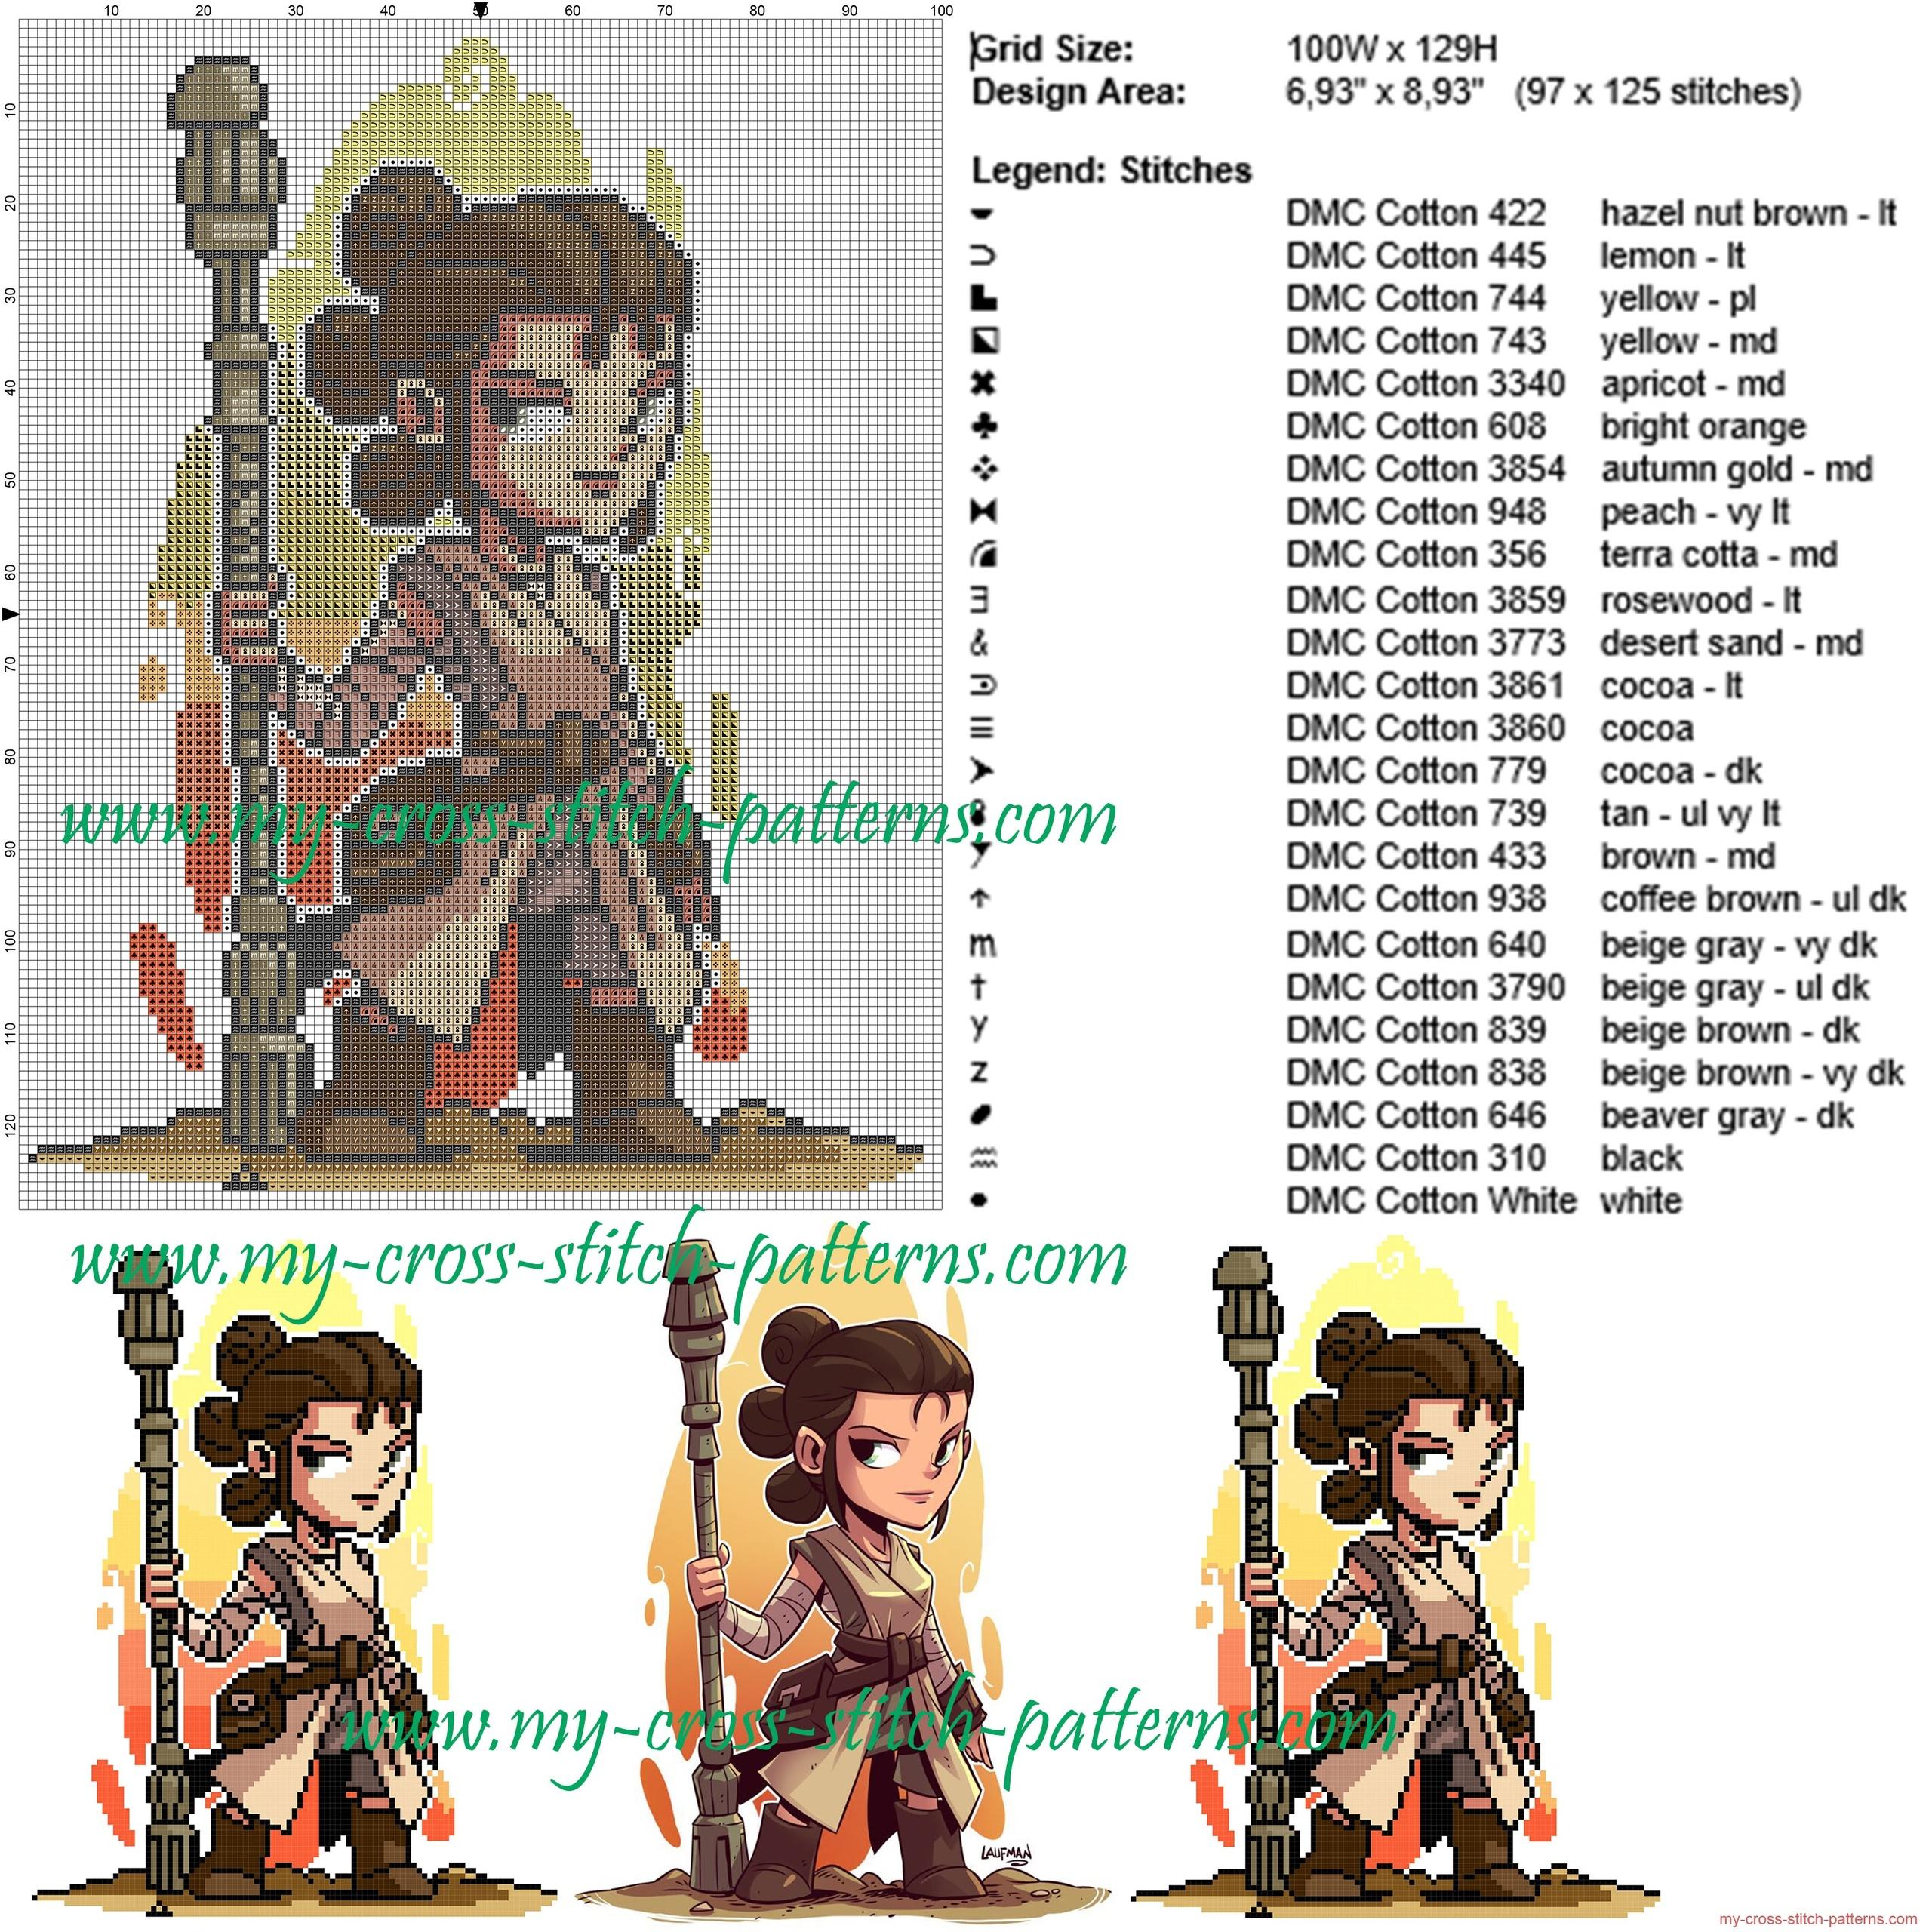 rey_star_wars_cross_stitch_pattern_